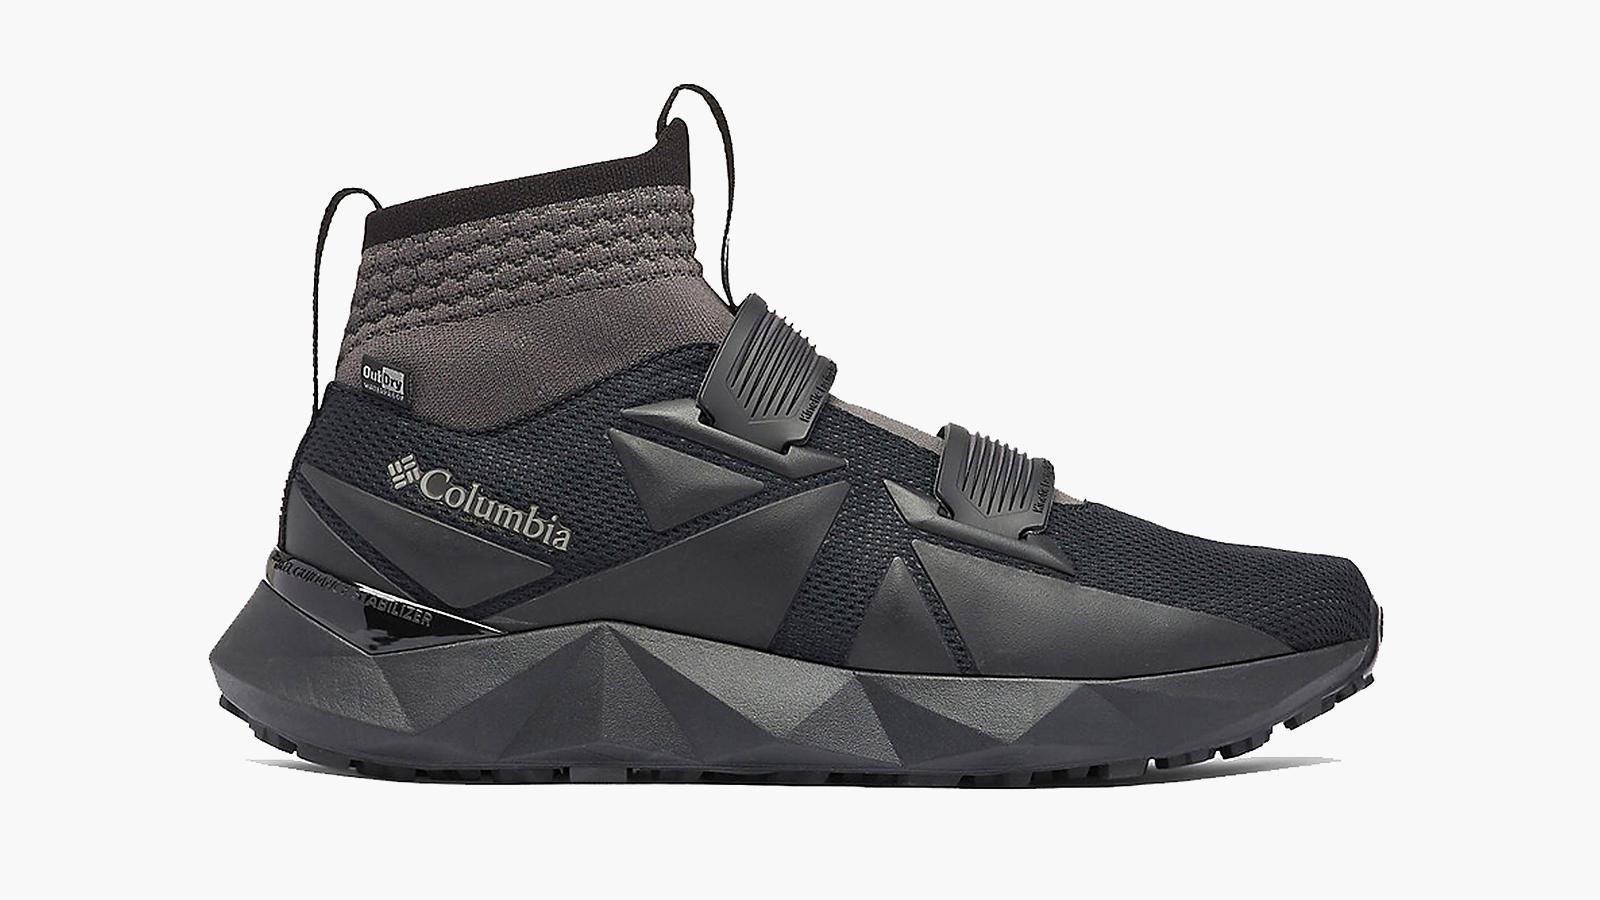 Columbia Facet 45 Outdry Shoe